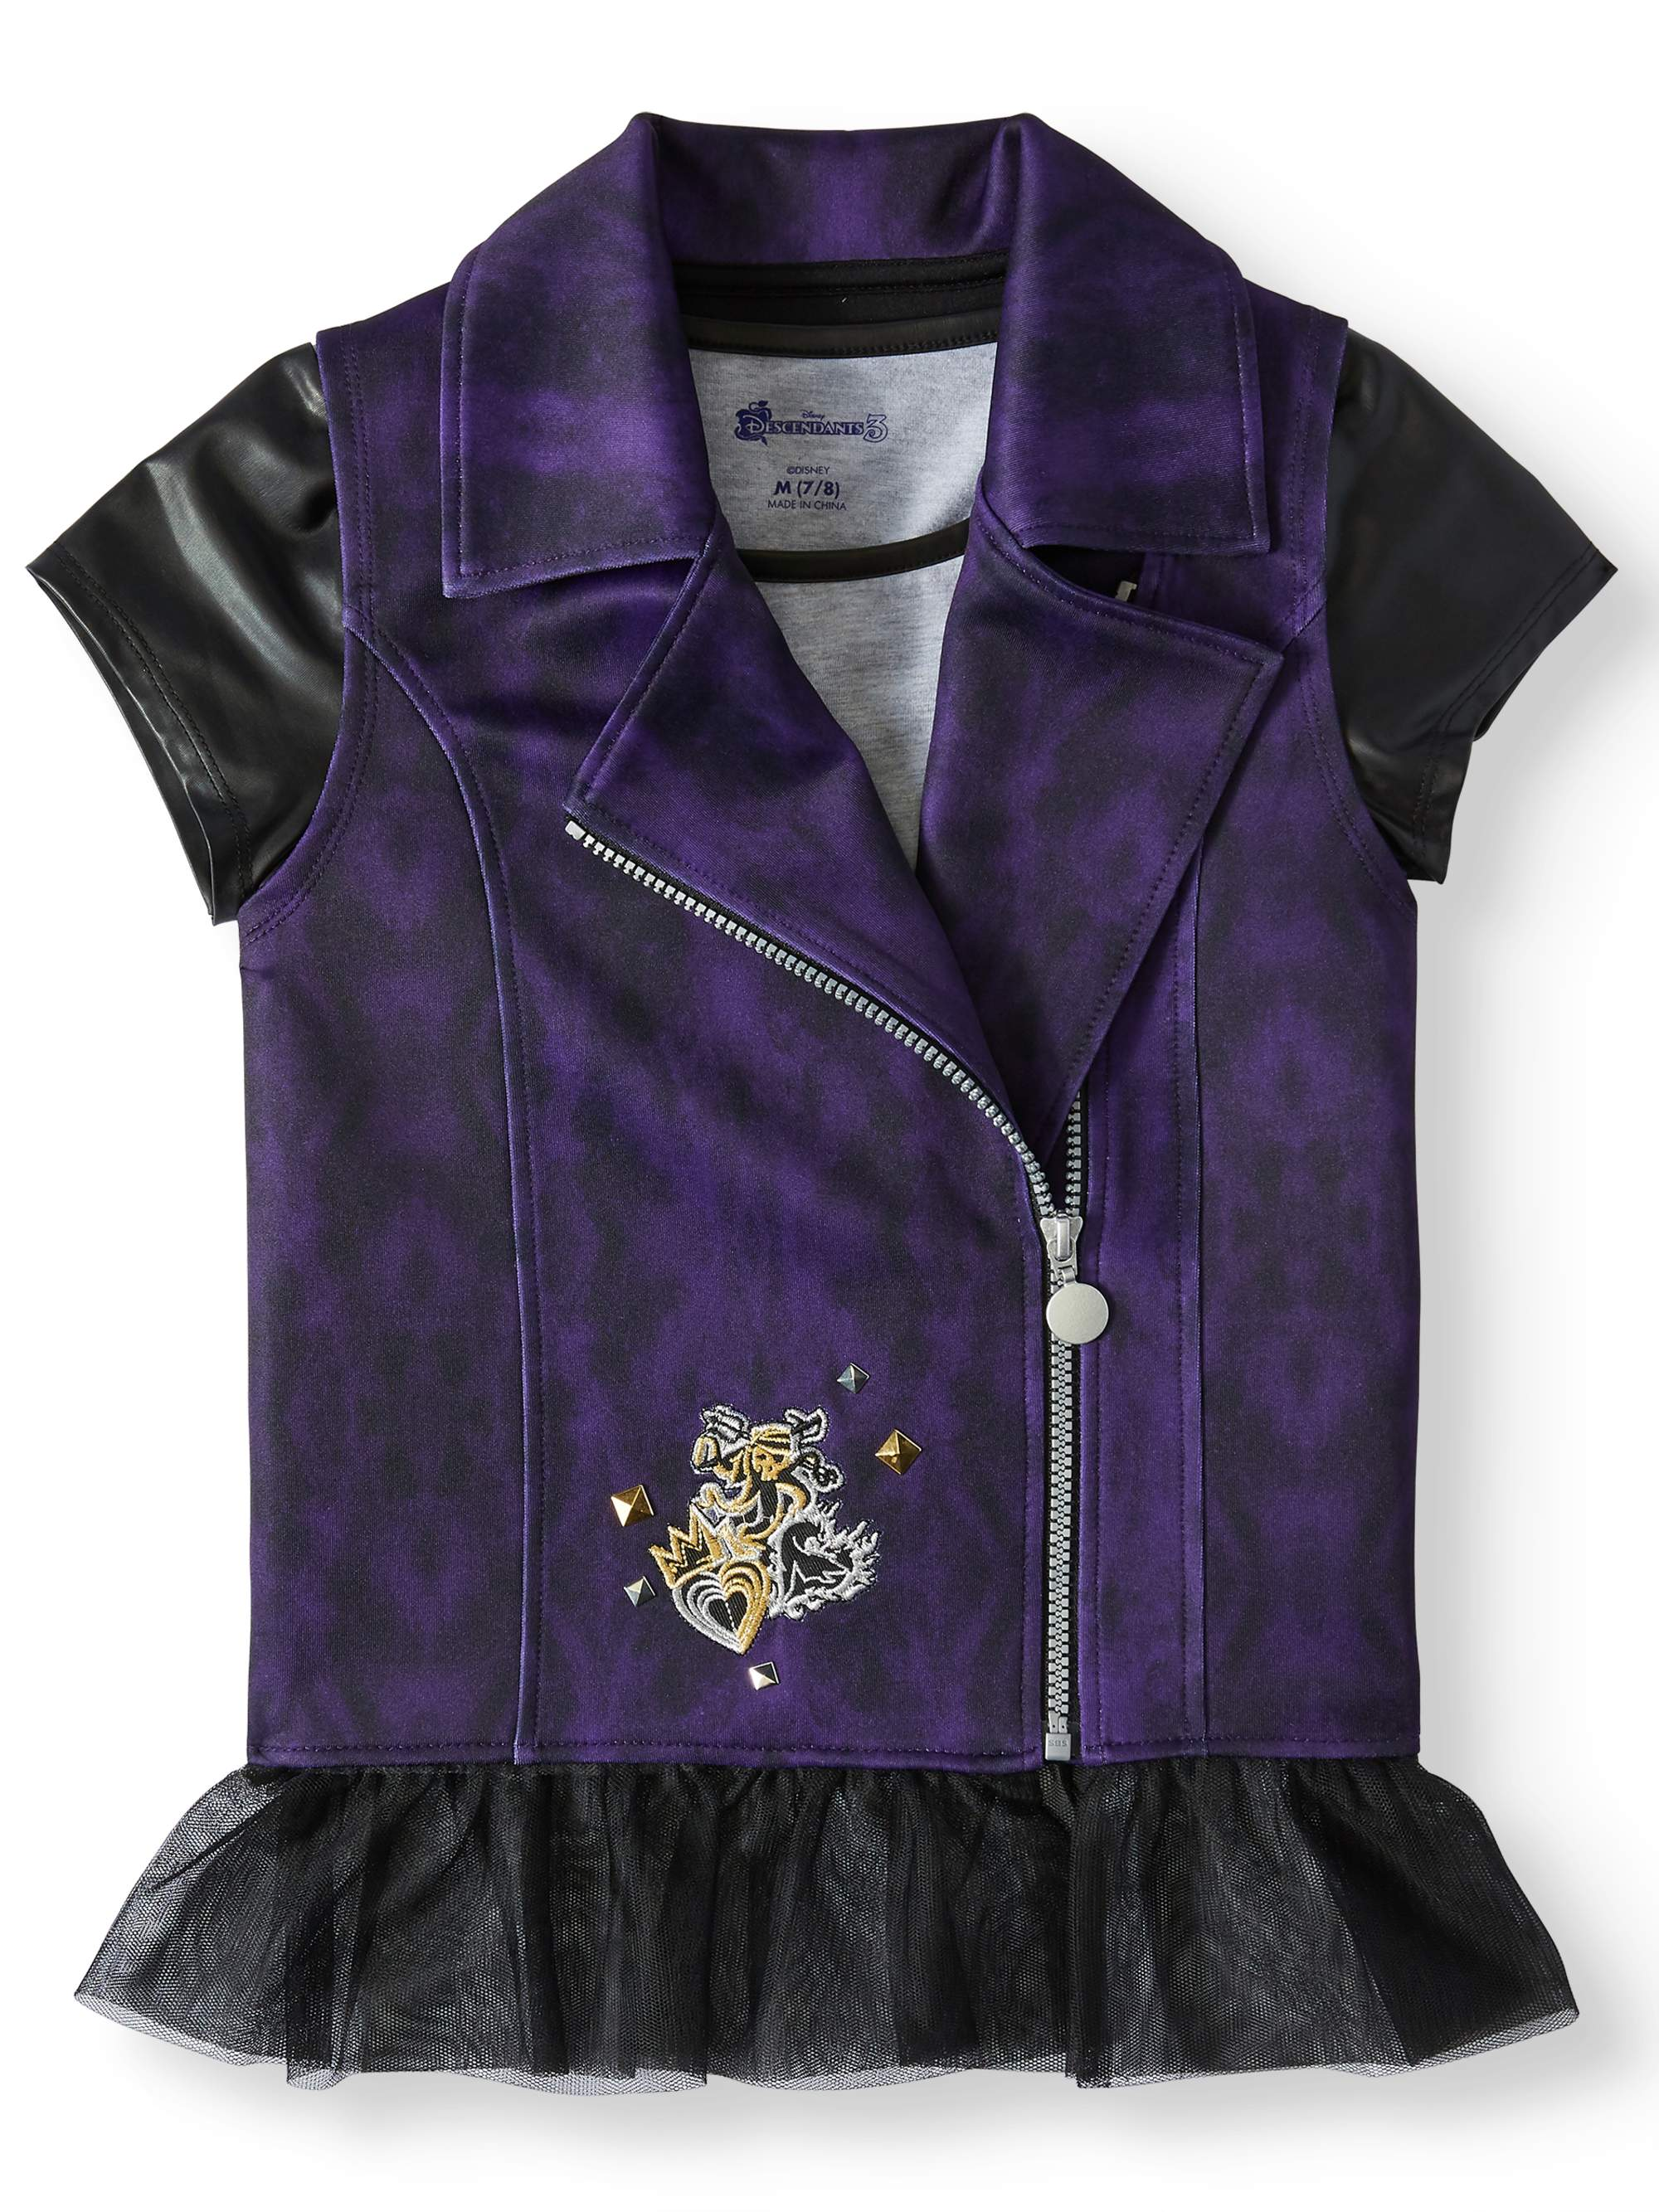 Little Girls /& Big Girls DESCENDANTS 3 Vest Top Combo Pack